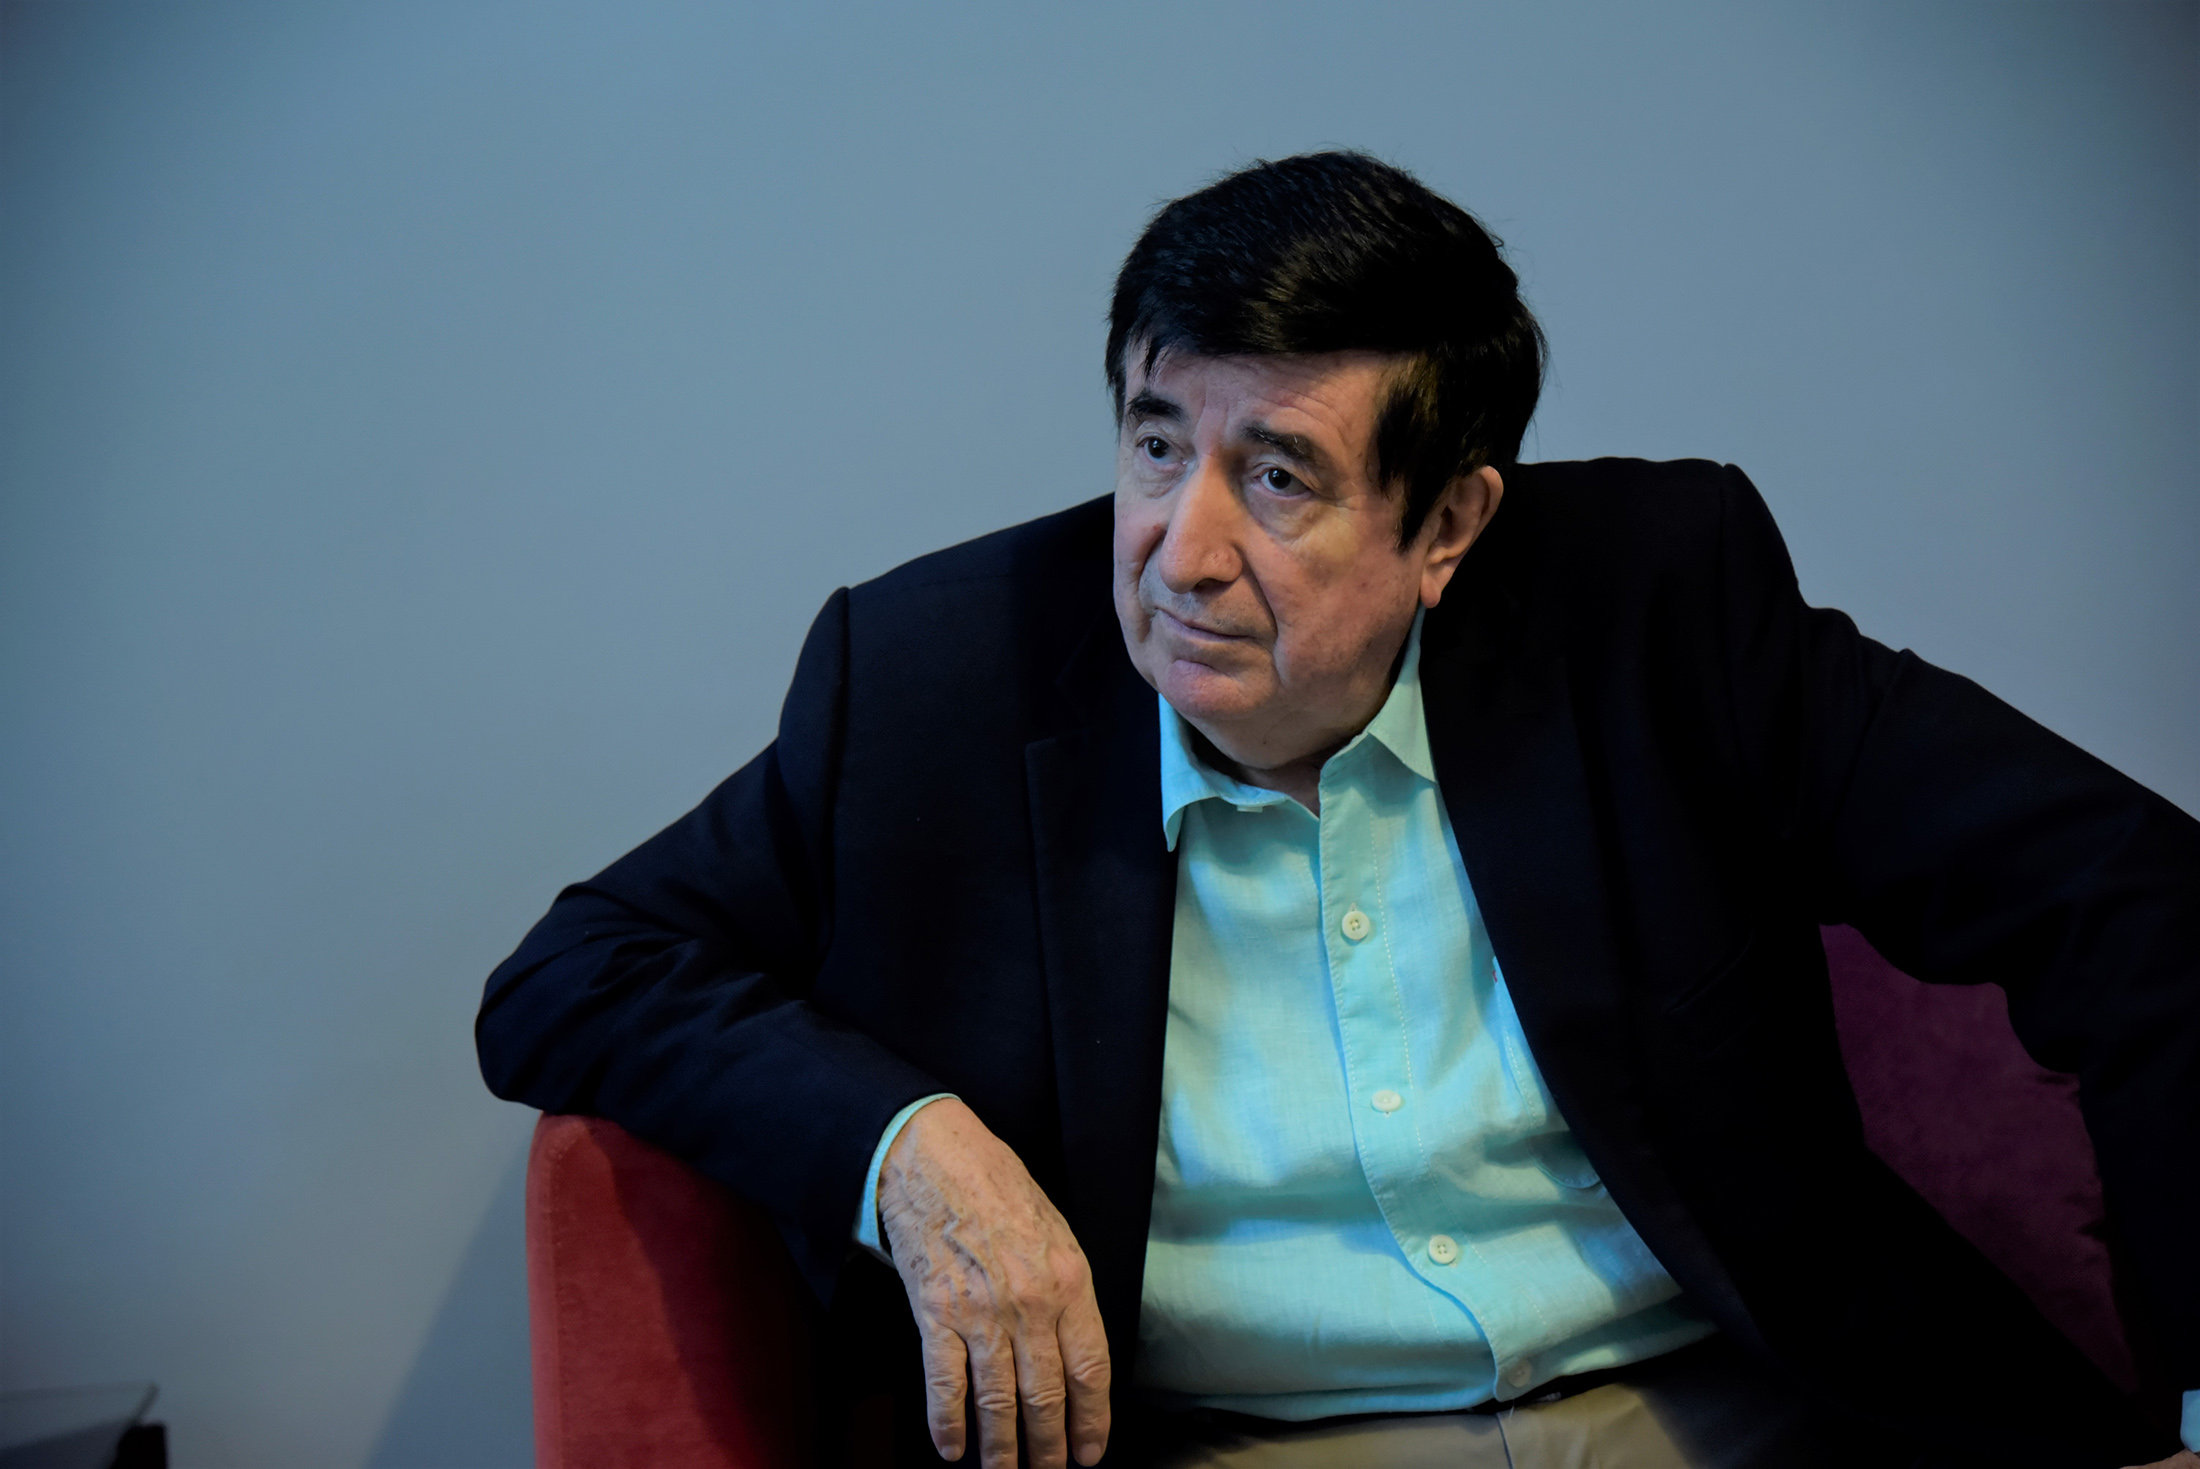 bloomberg.com - Patrick Gillespie - As Argentine Bonds Slump, Macri Adviser Says Market Has It Wrong